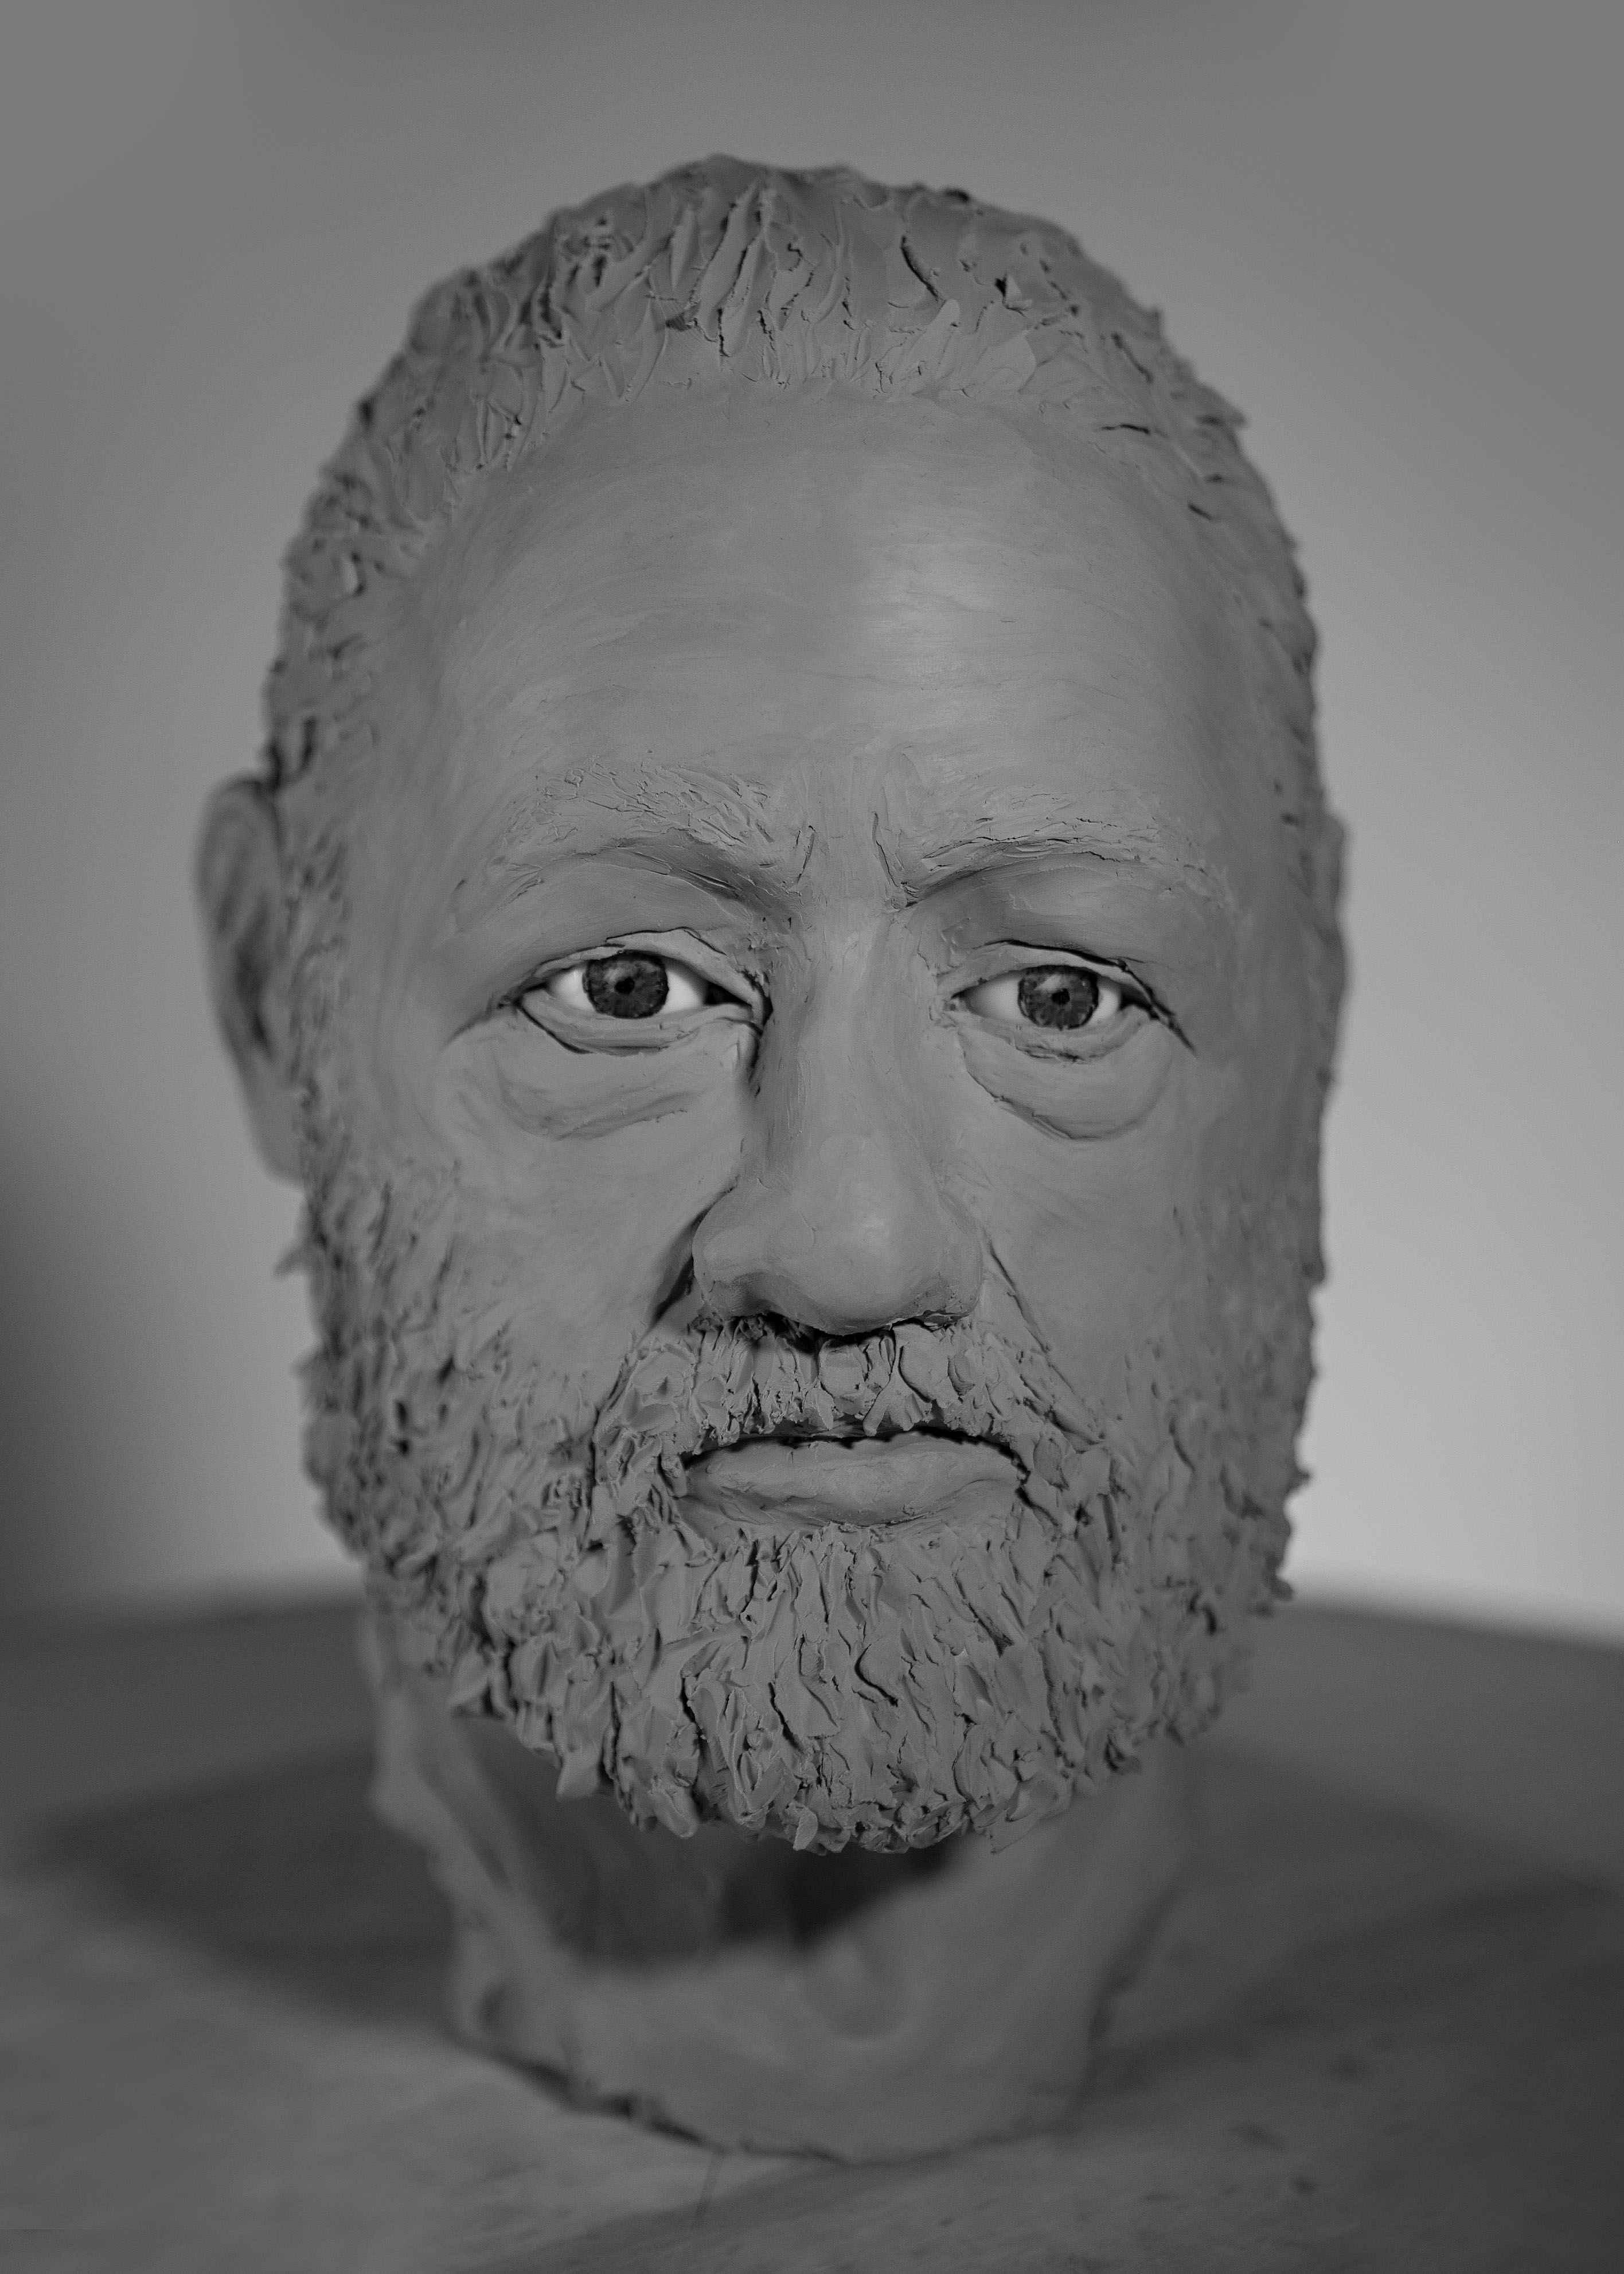 West Vancouver John Doe (1996)